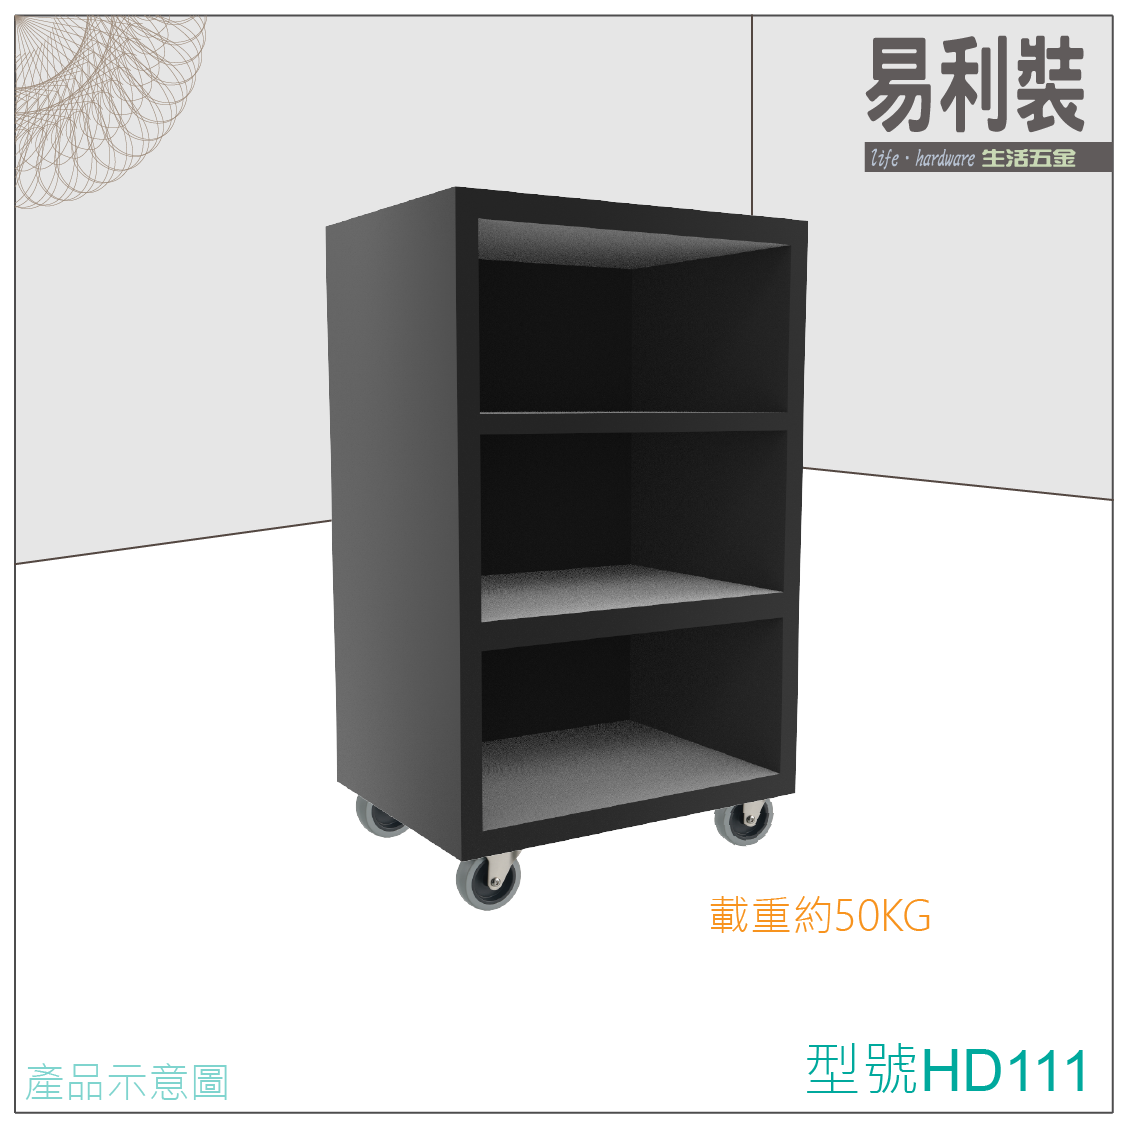 【 EASYCAN  】HD111-活動輪 易利裝生活五金 桌輪 櫃輪 房間 臥房 衣櫃 小資族 辦公家具 系統家具 2